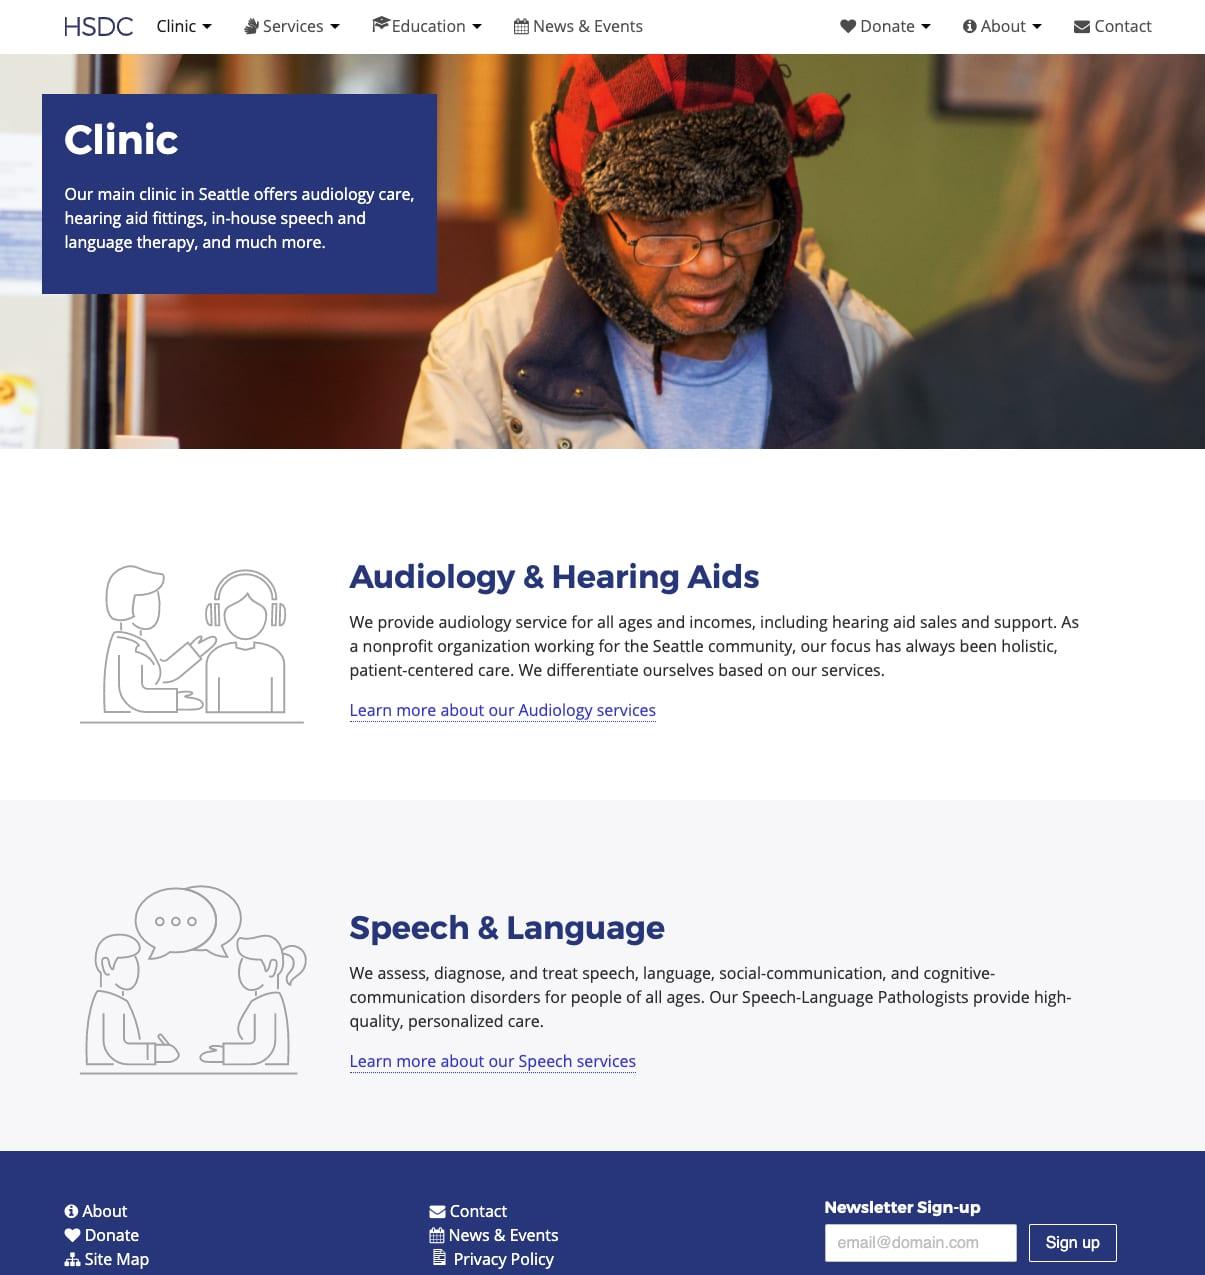 The HSDC website